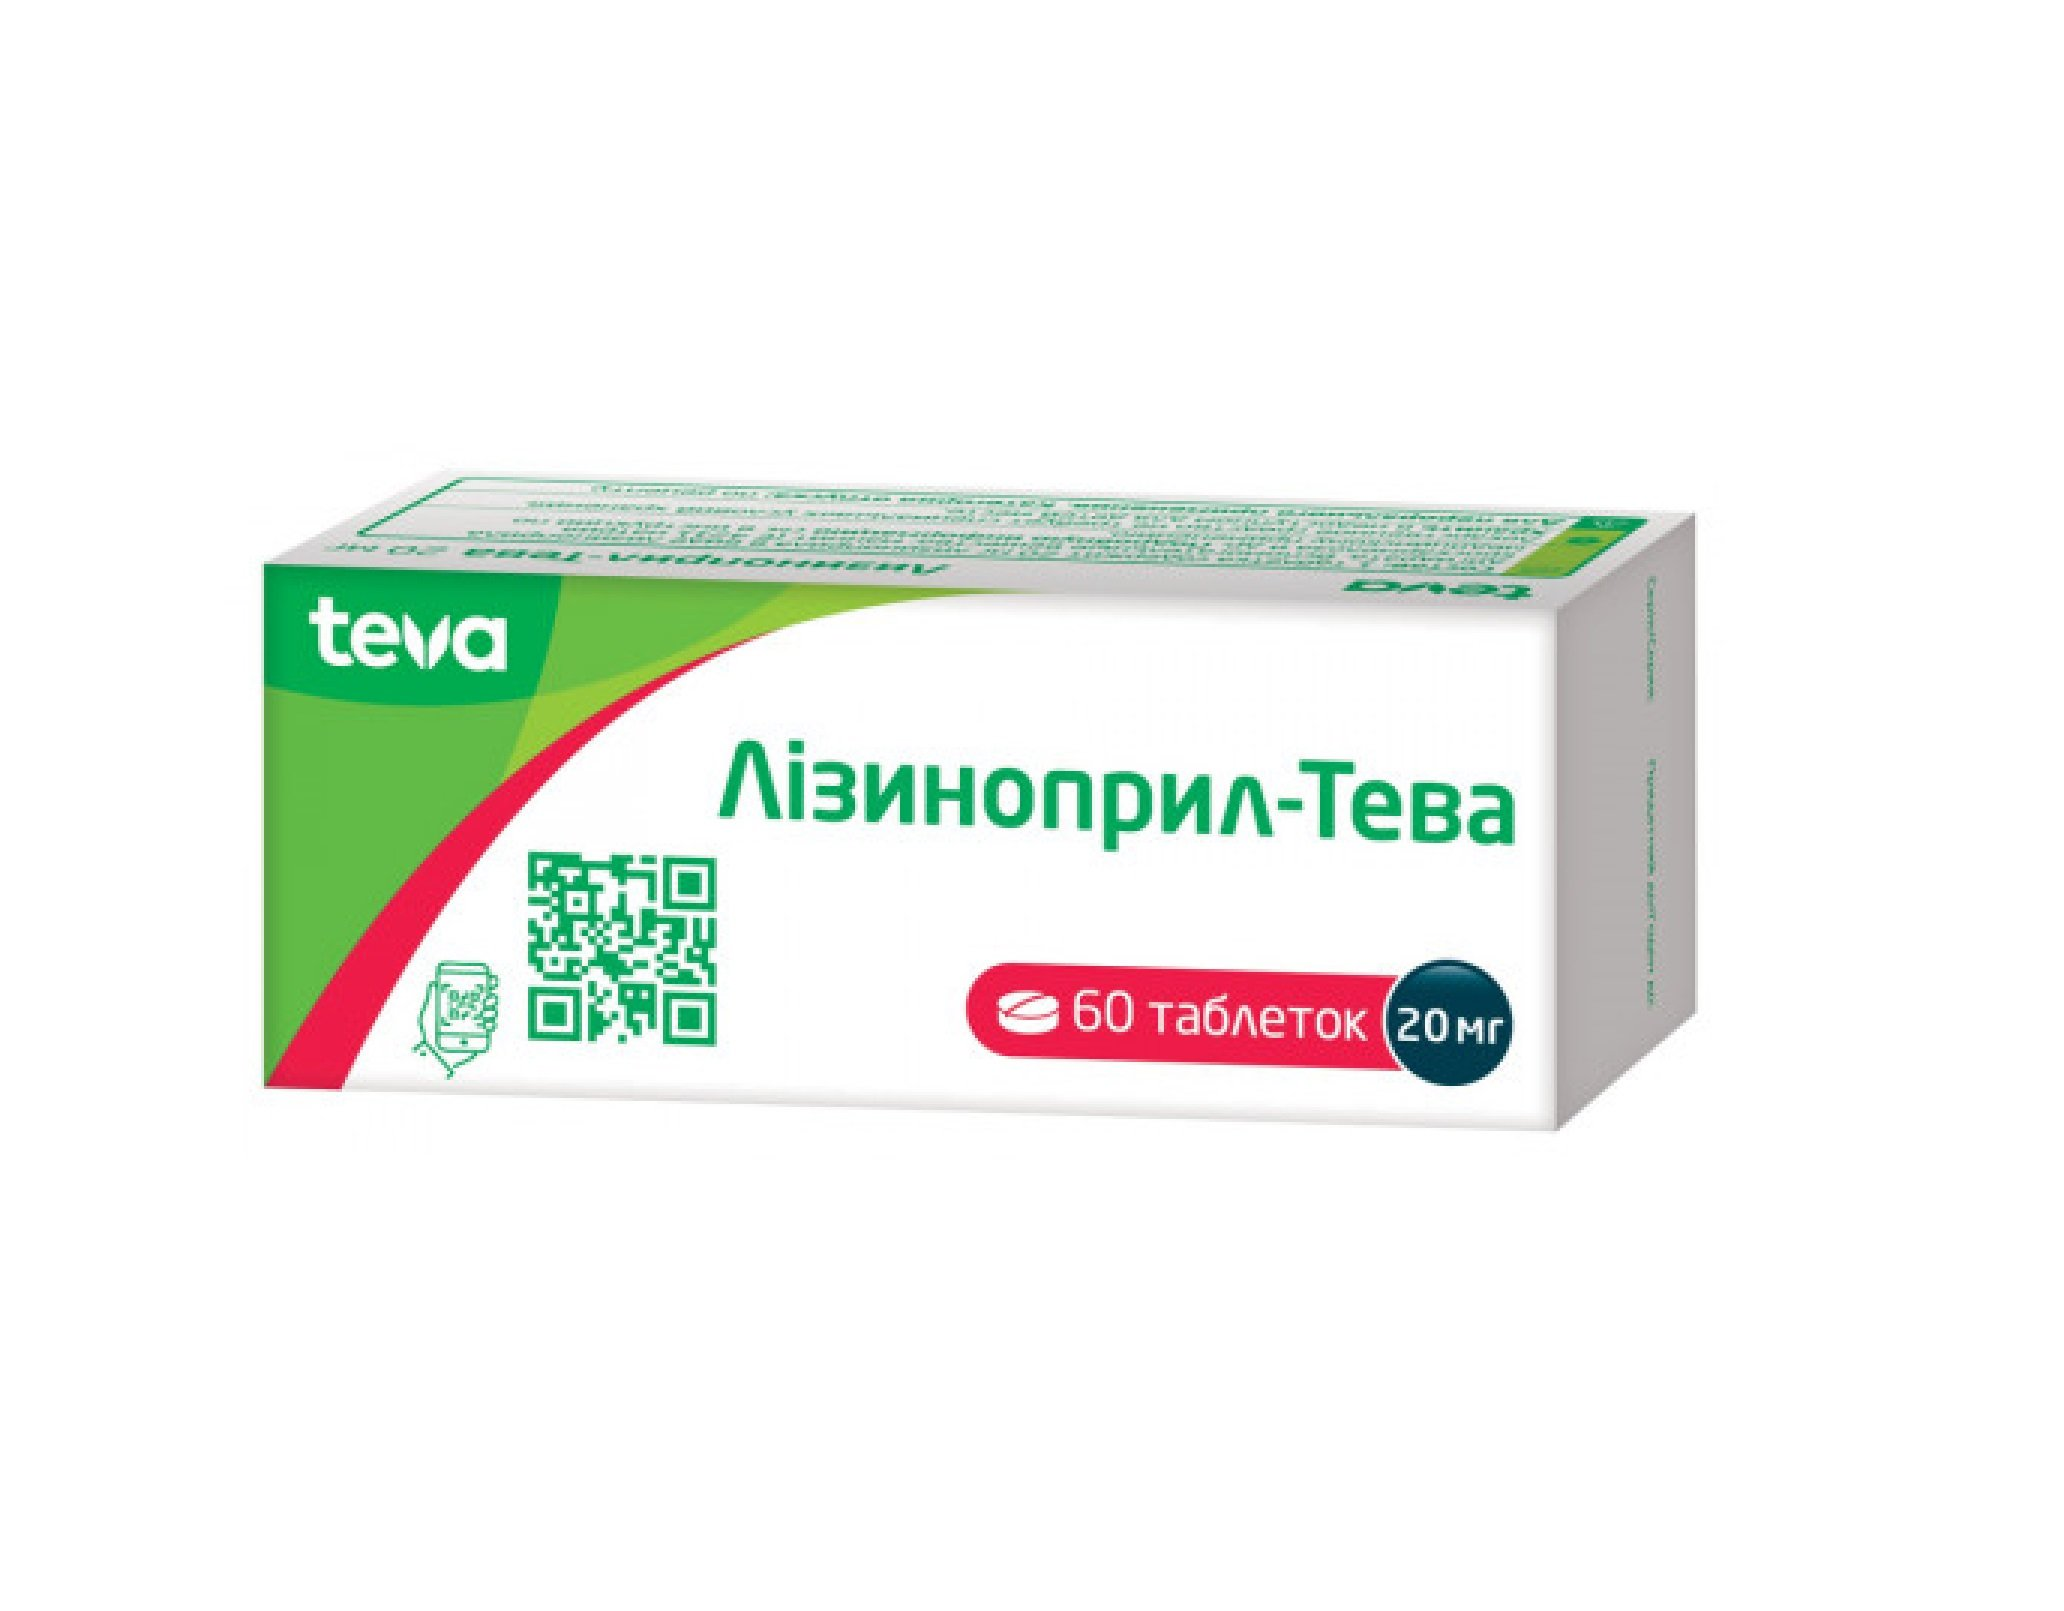 Lisinopril-Teva-20-mg-tablets-20-mg-n60